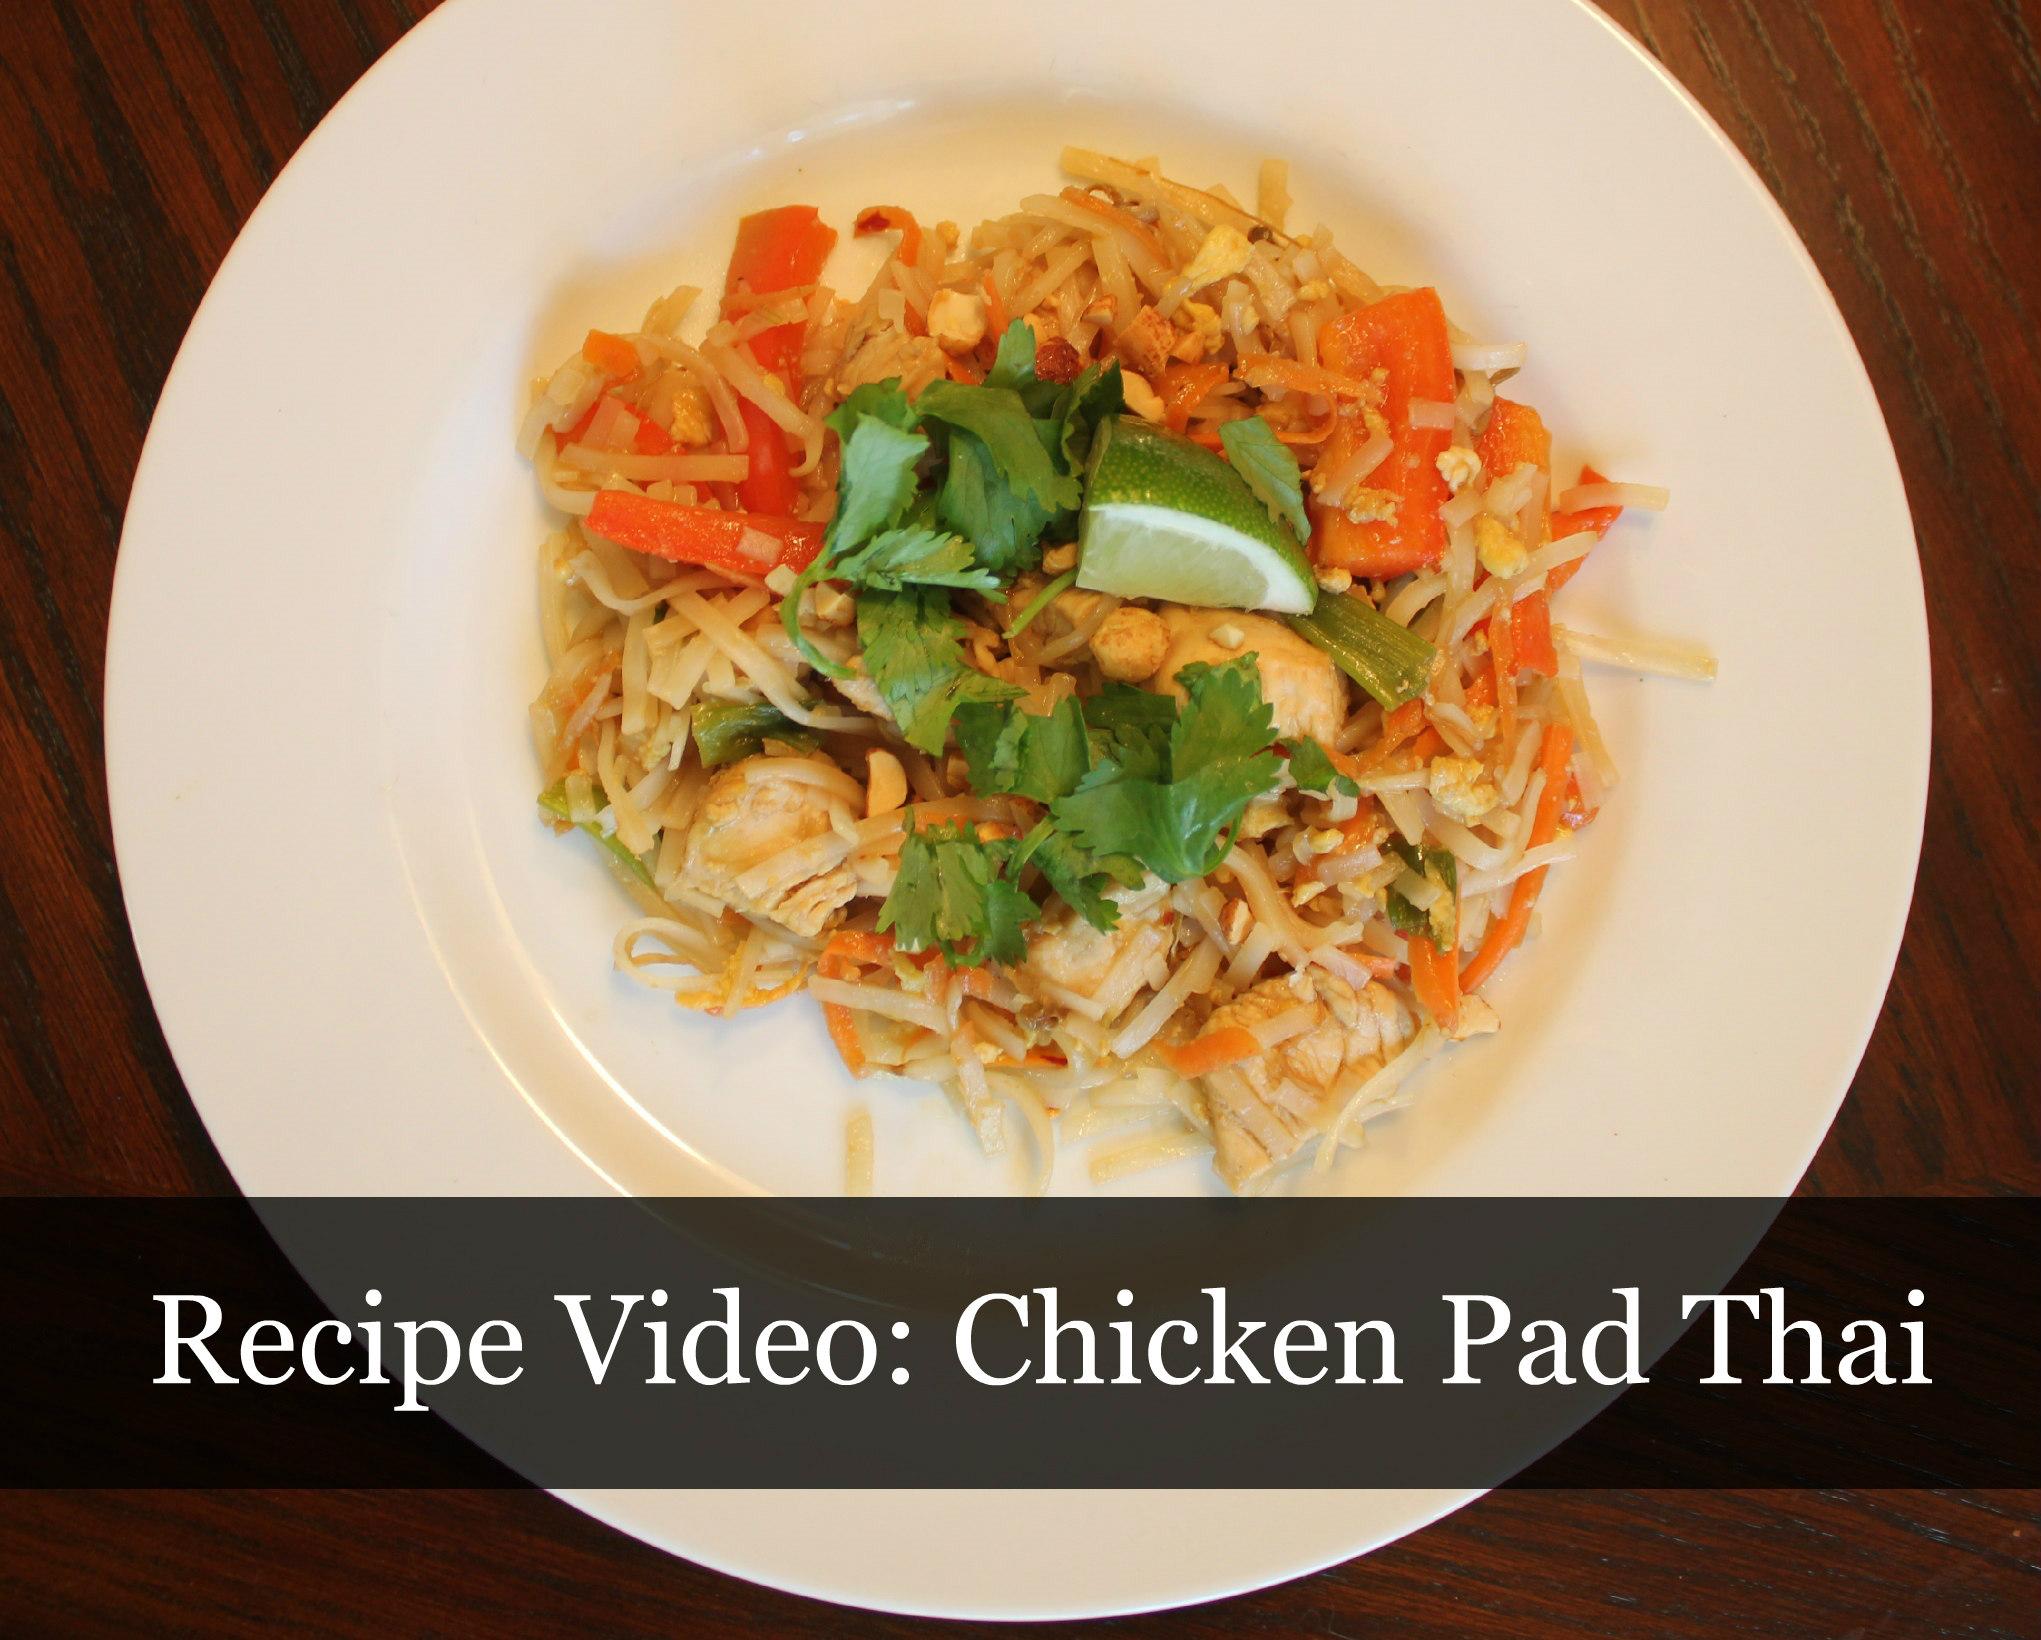 Recipe video chicken pad thai recipe video chicken pad thai forumfinder Image collections